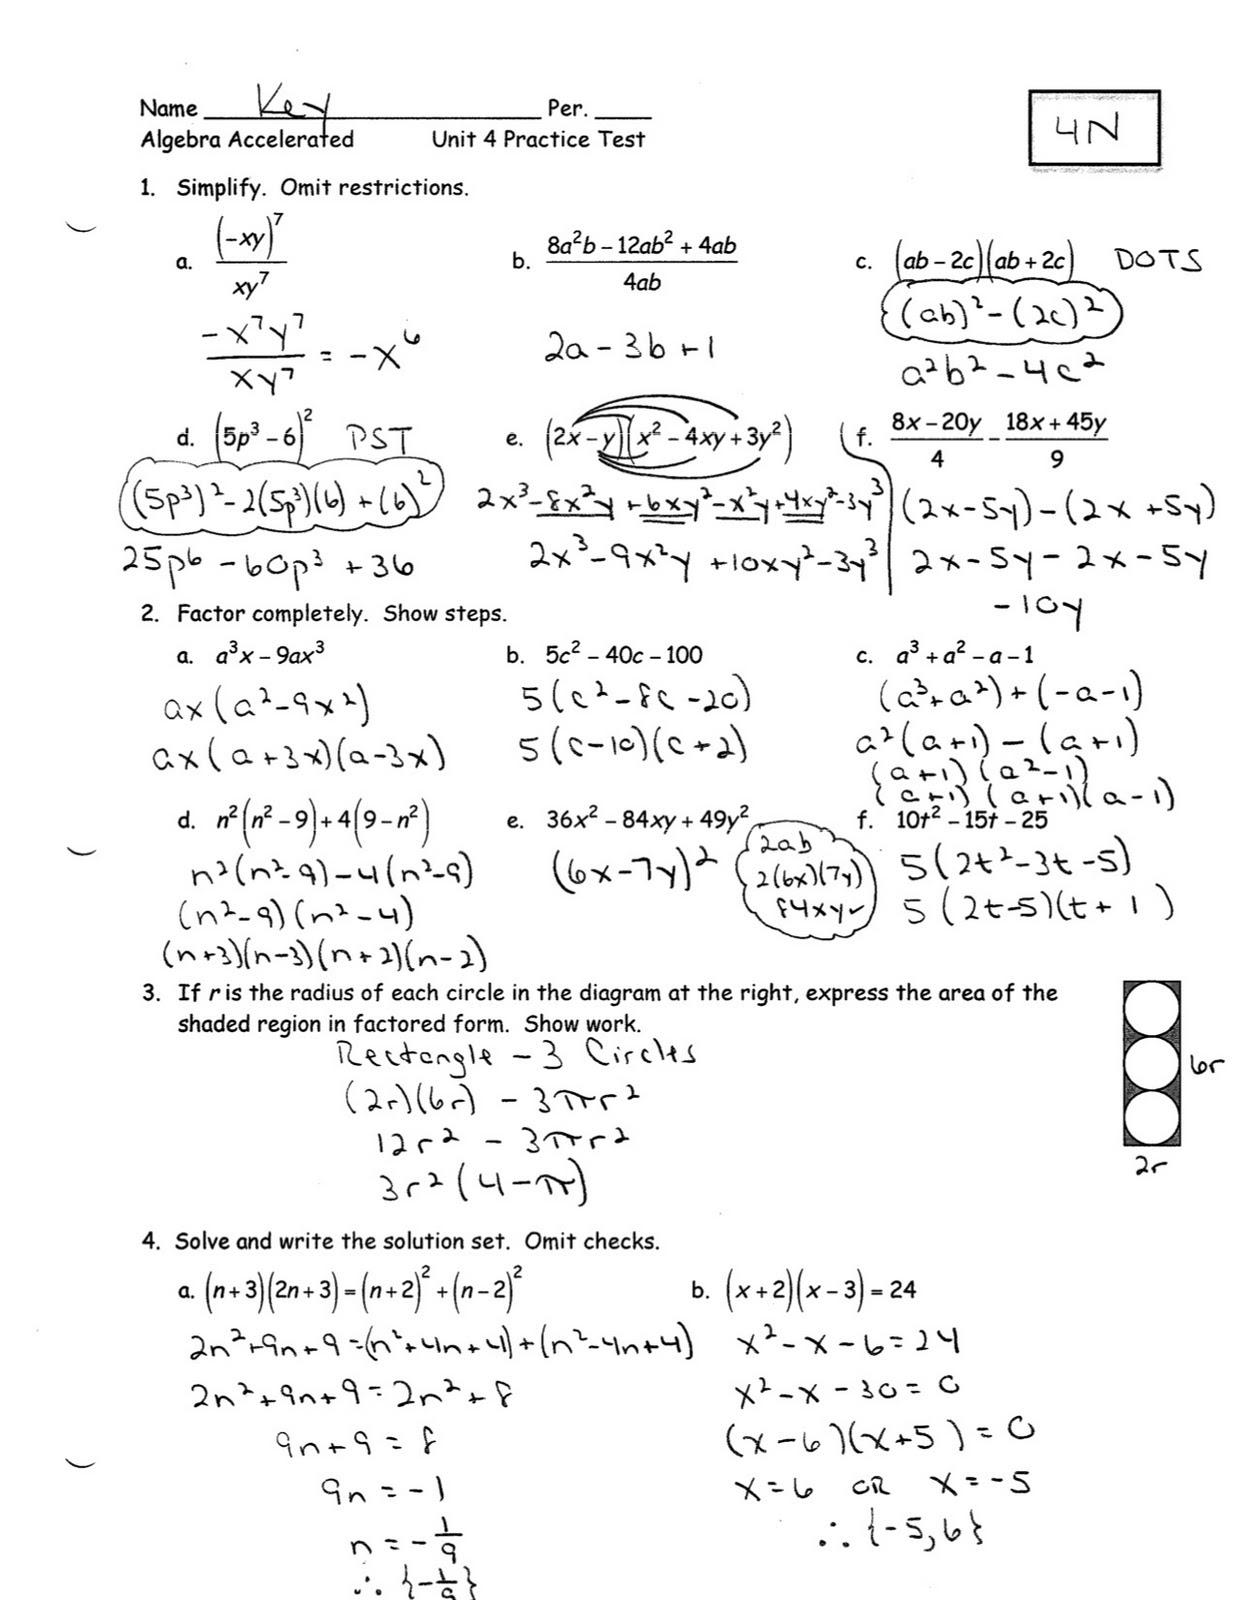 Algebra 1 test answer key | A Plus Algebra